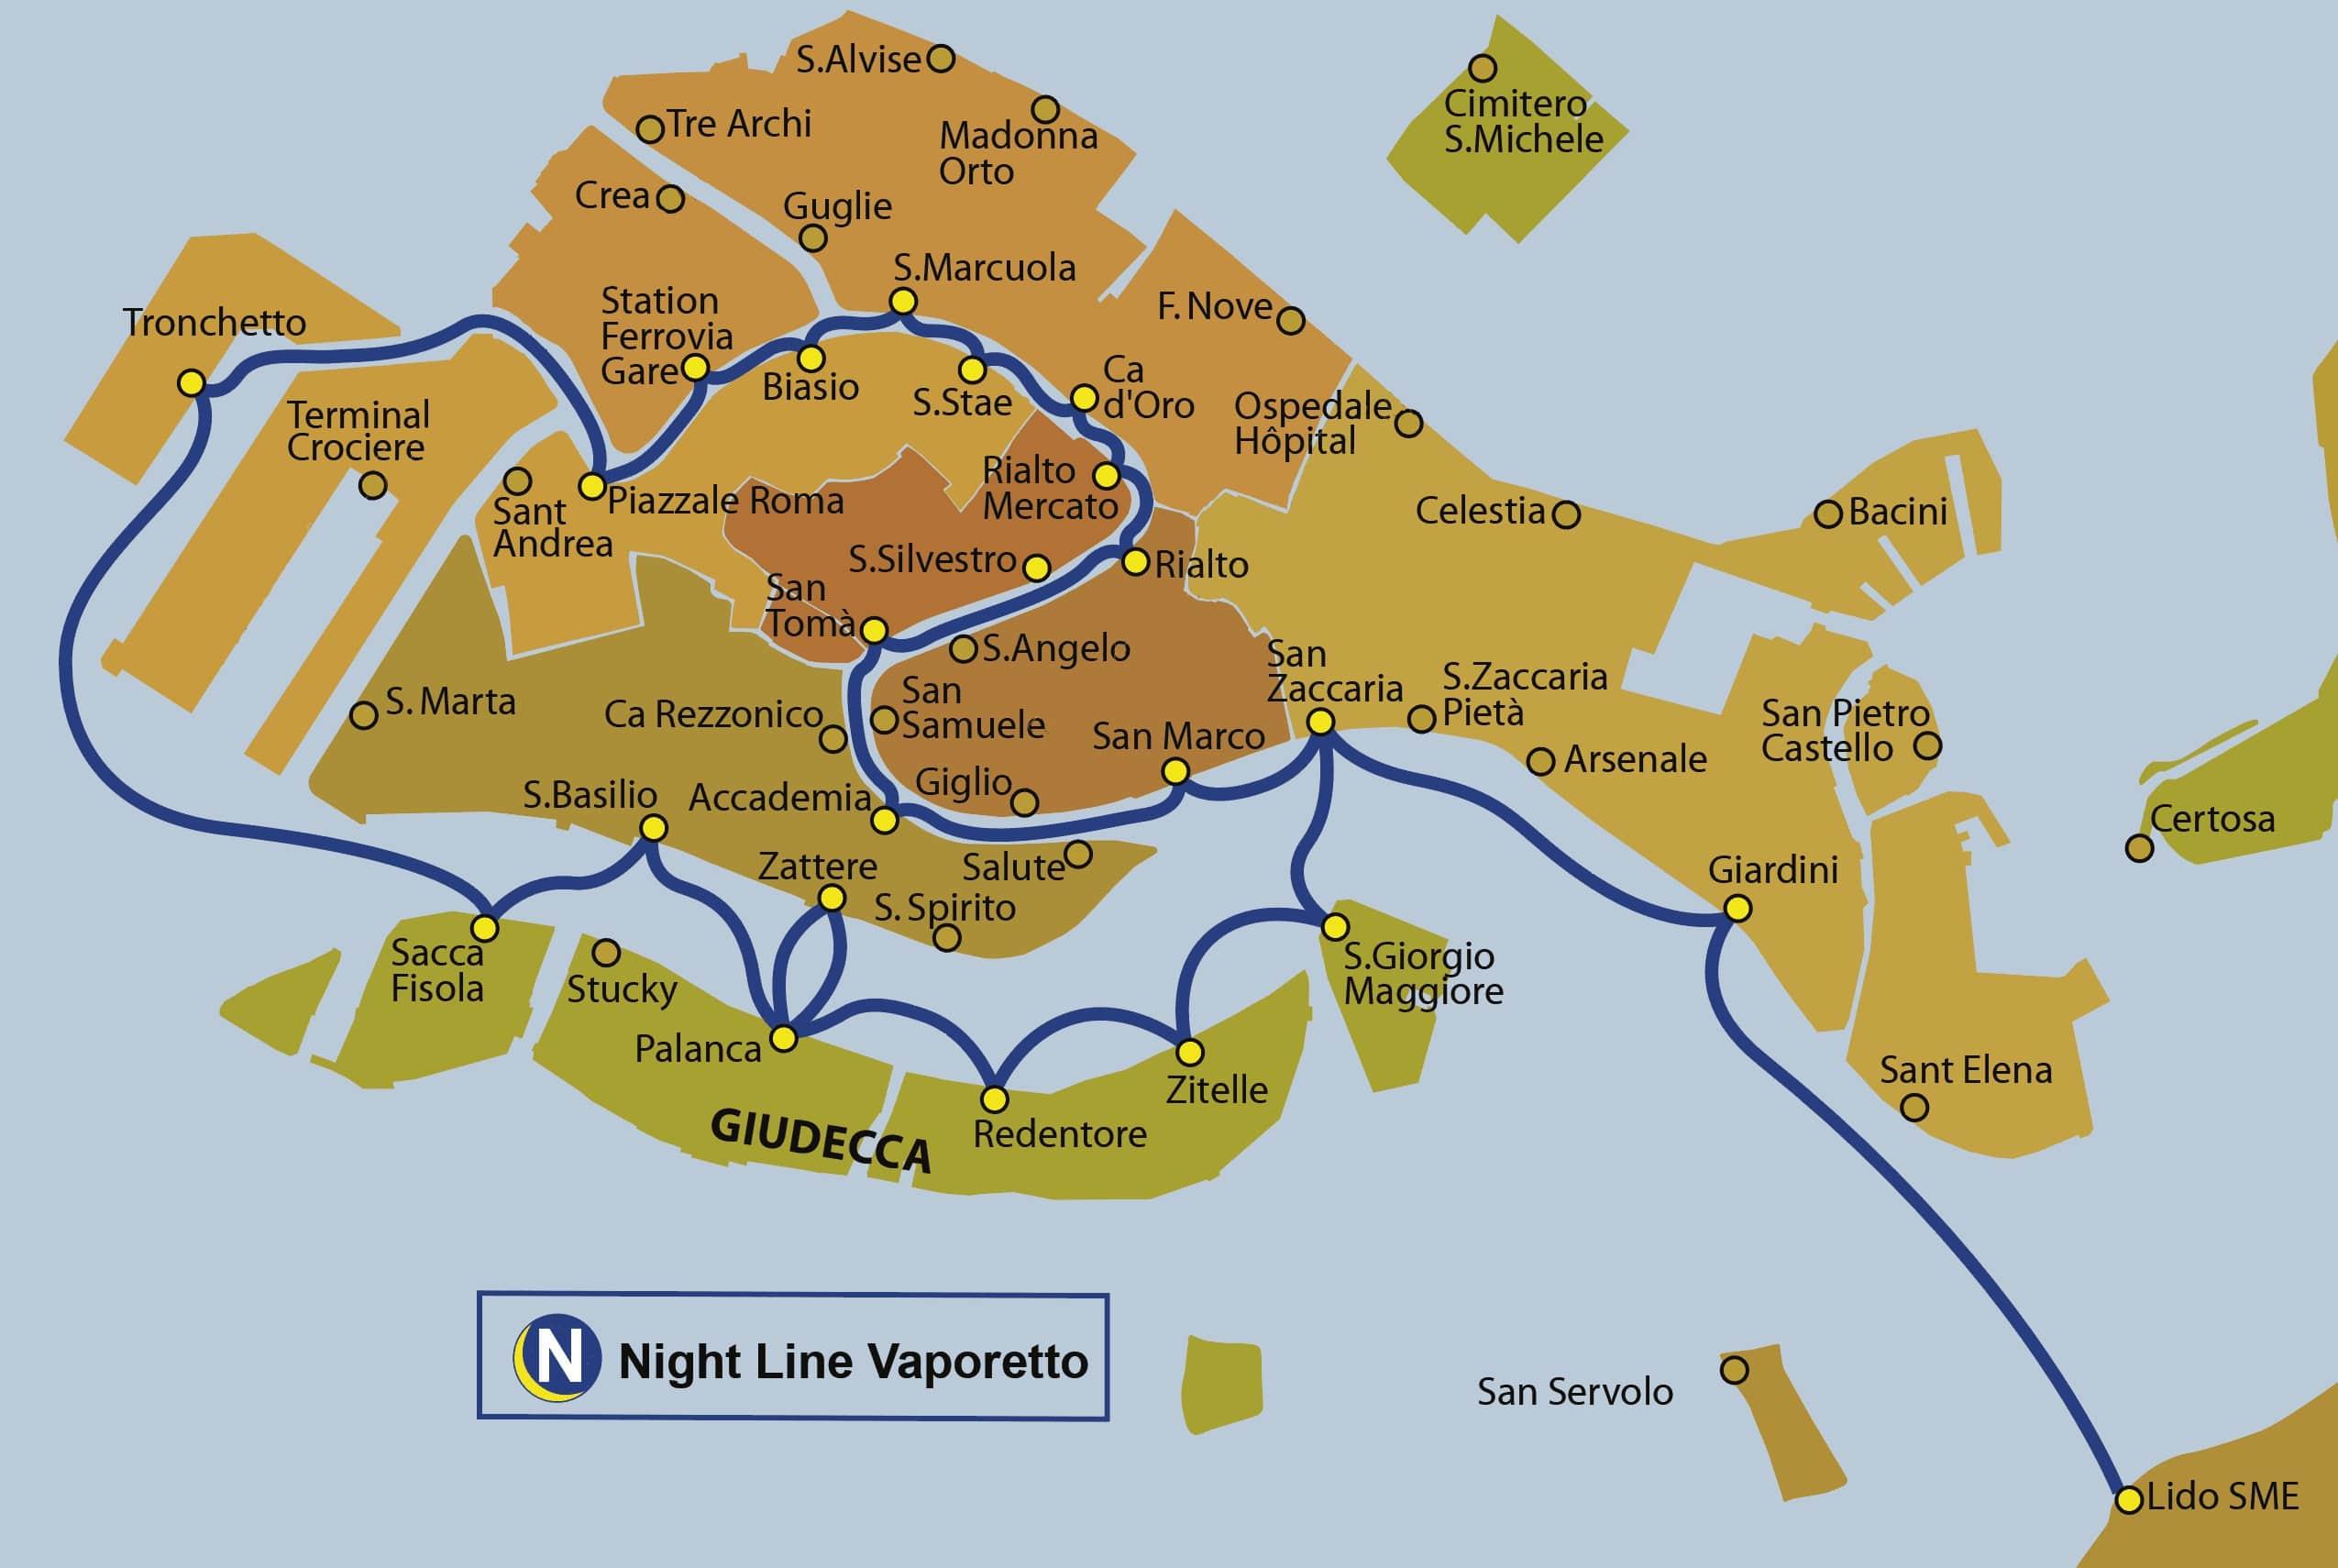 Схема ночного маршрута N вапоретто в Венеции